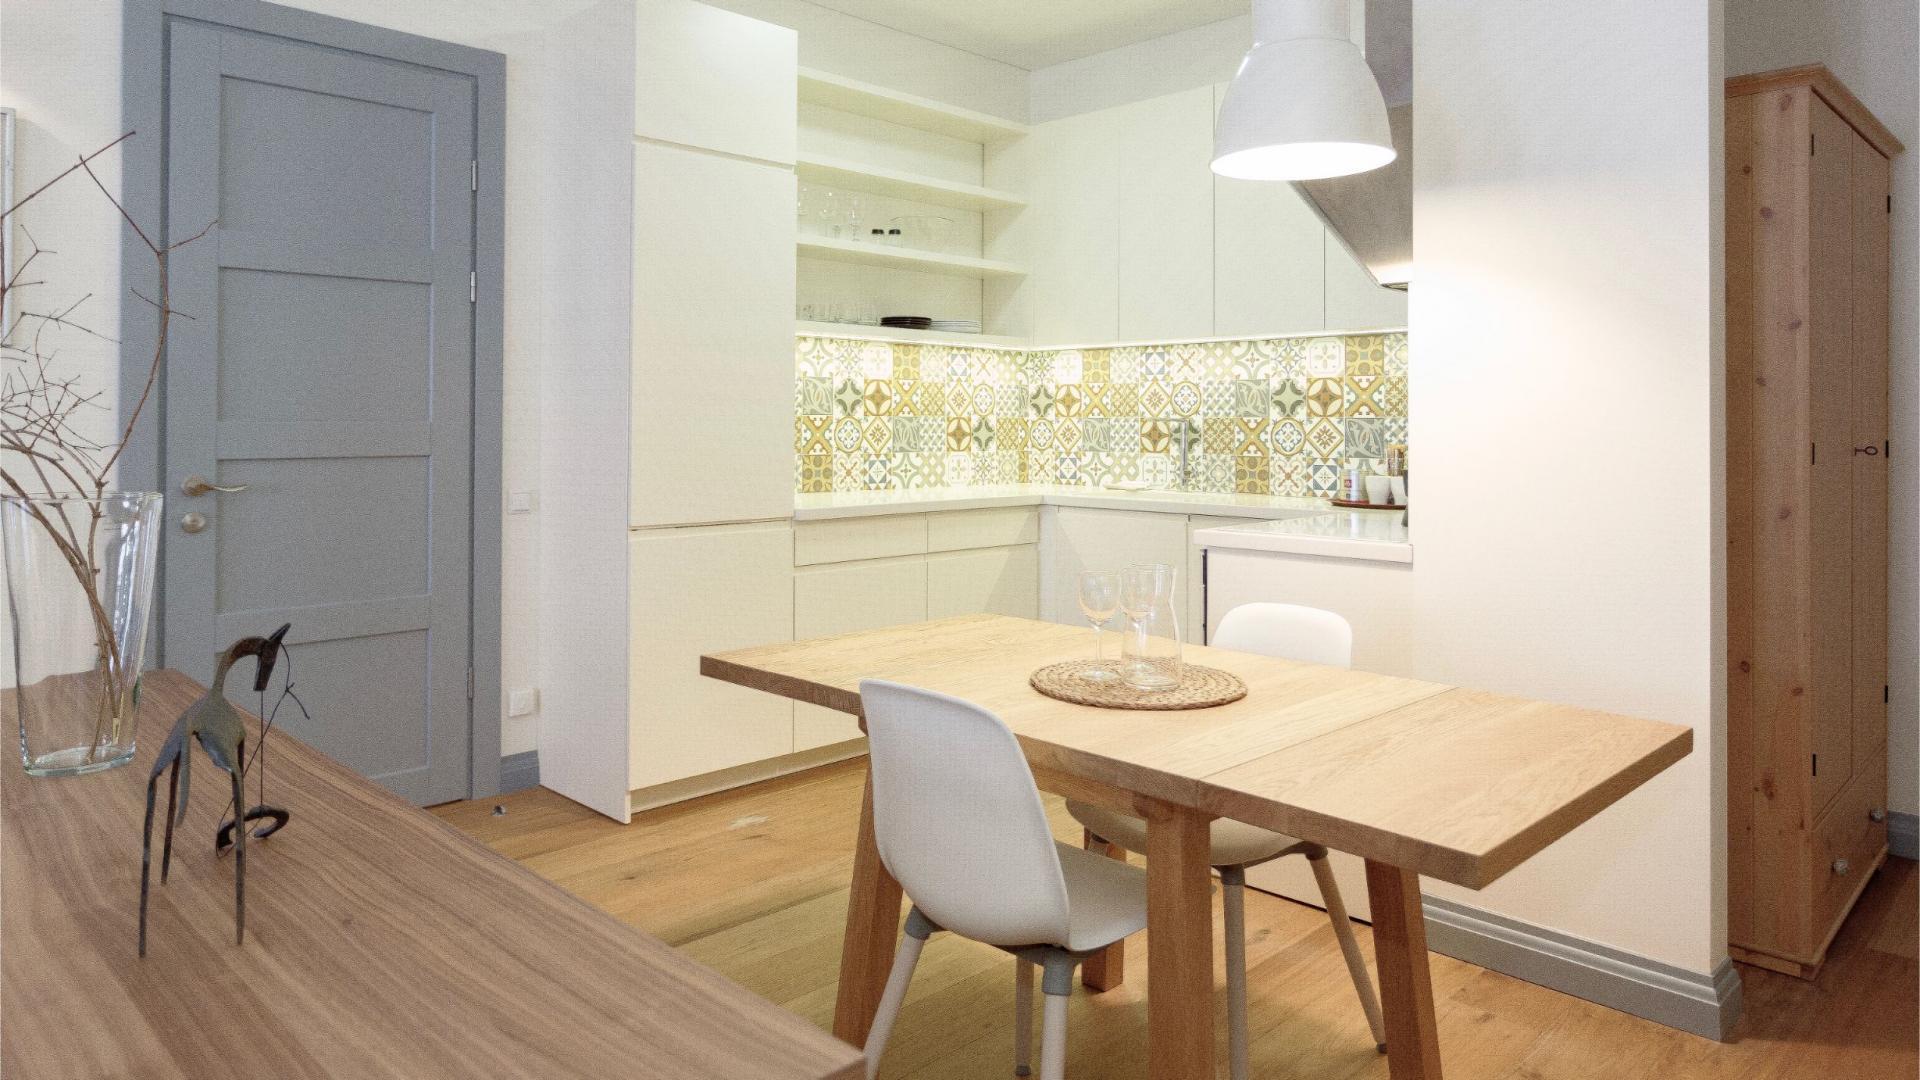 Kitchen at Siauliu Town Hall Apartment